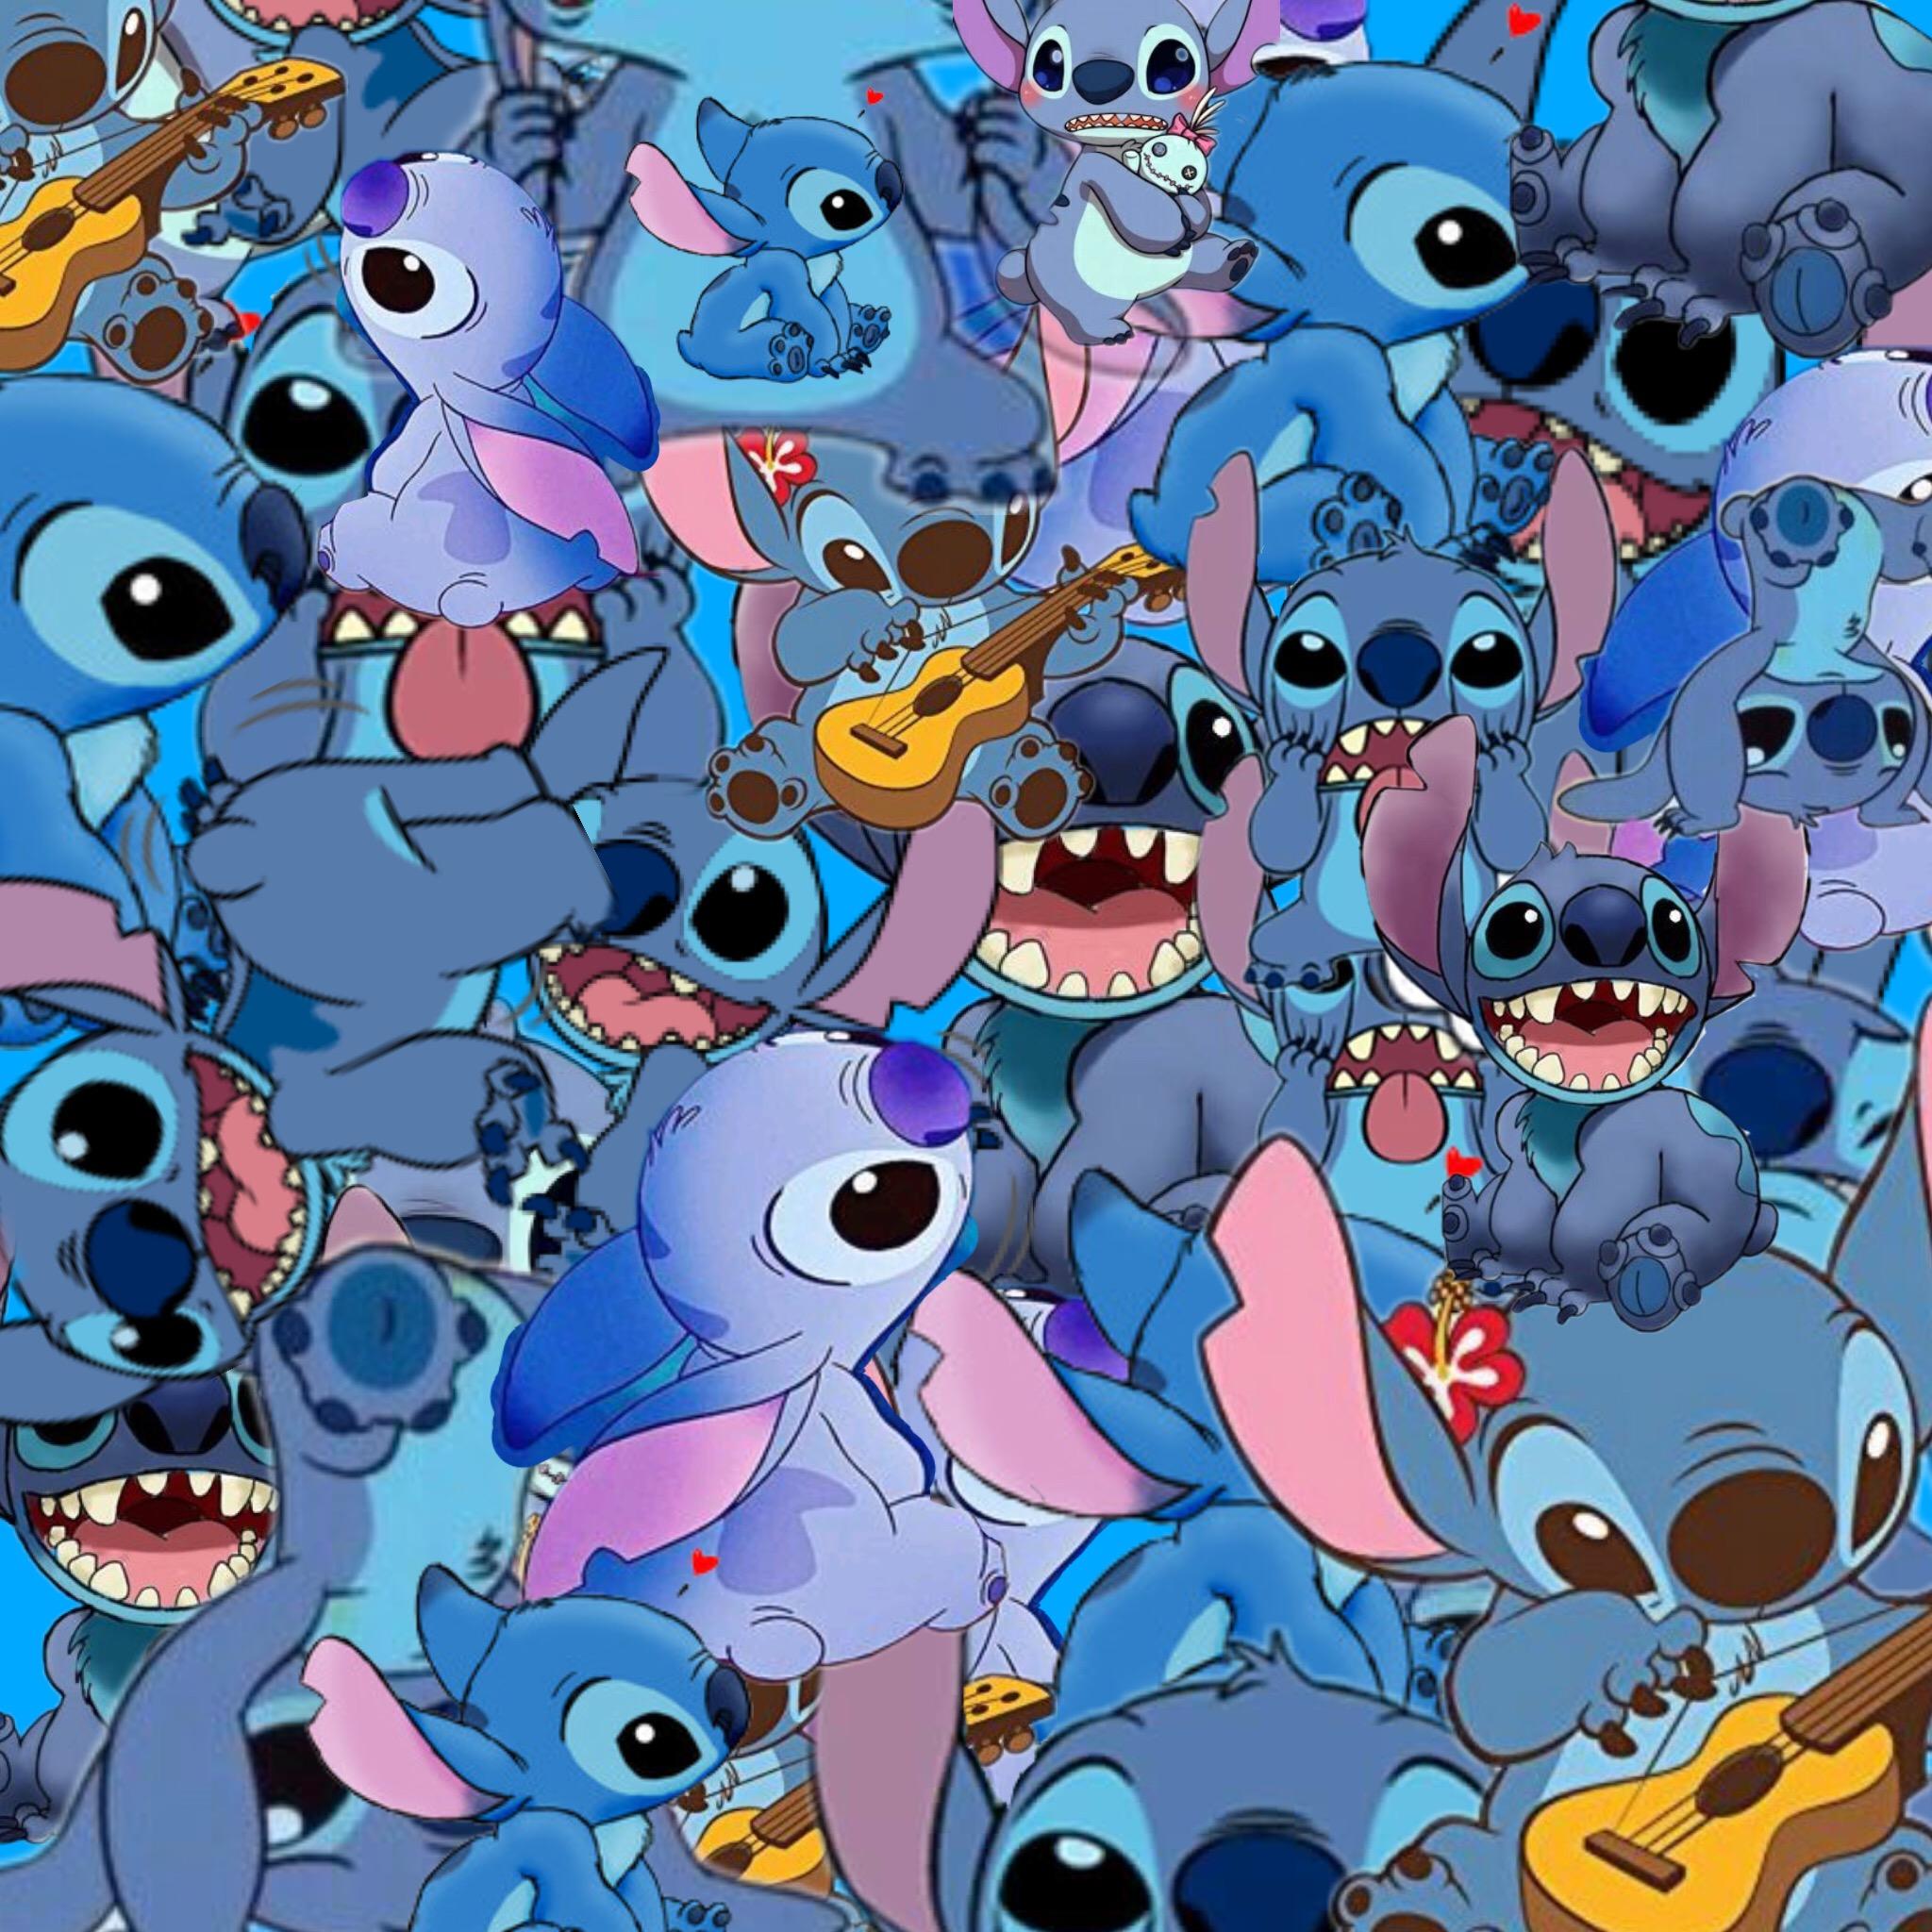 Freetoedit Wallpaper Stitch Blue Art Interesting Stitch Halloween 2048x2048 Download Hd Wallpaper Wallpapertip